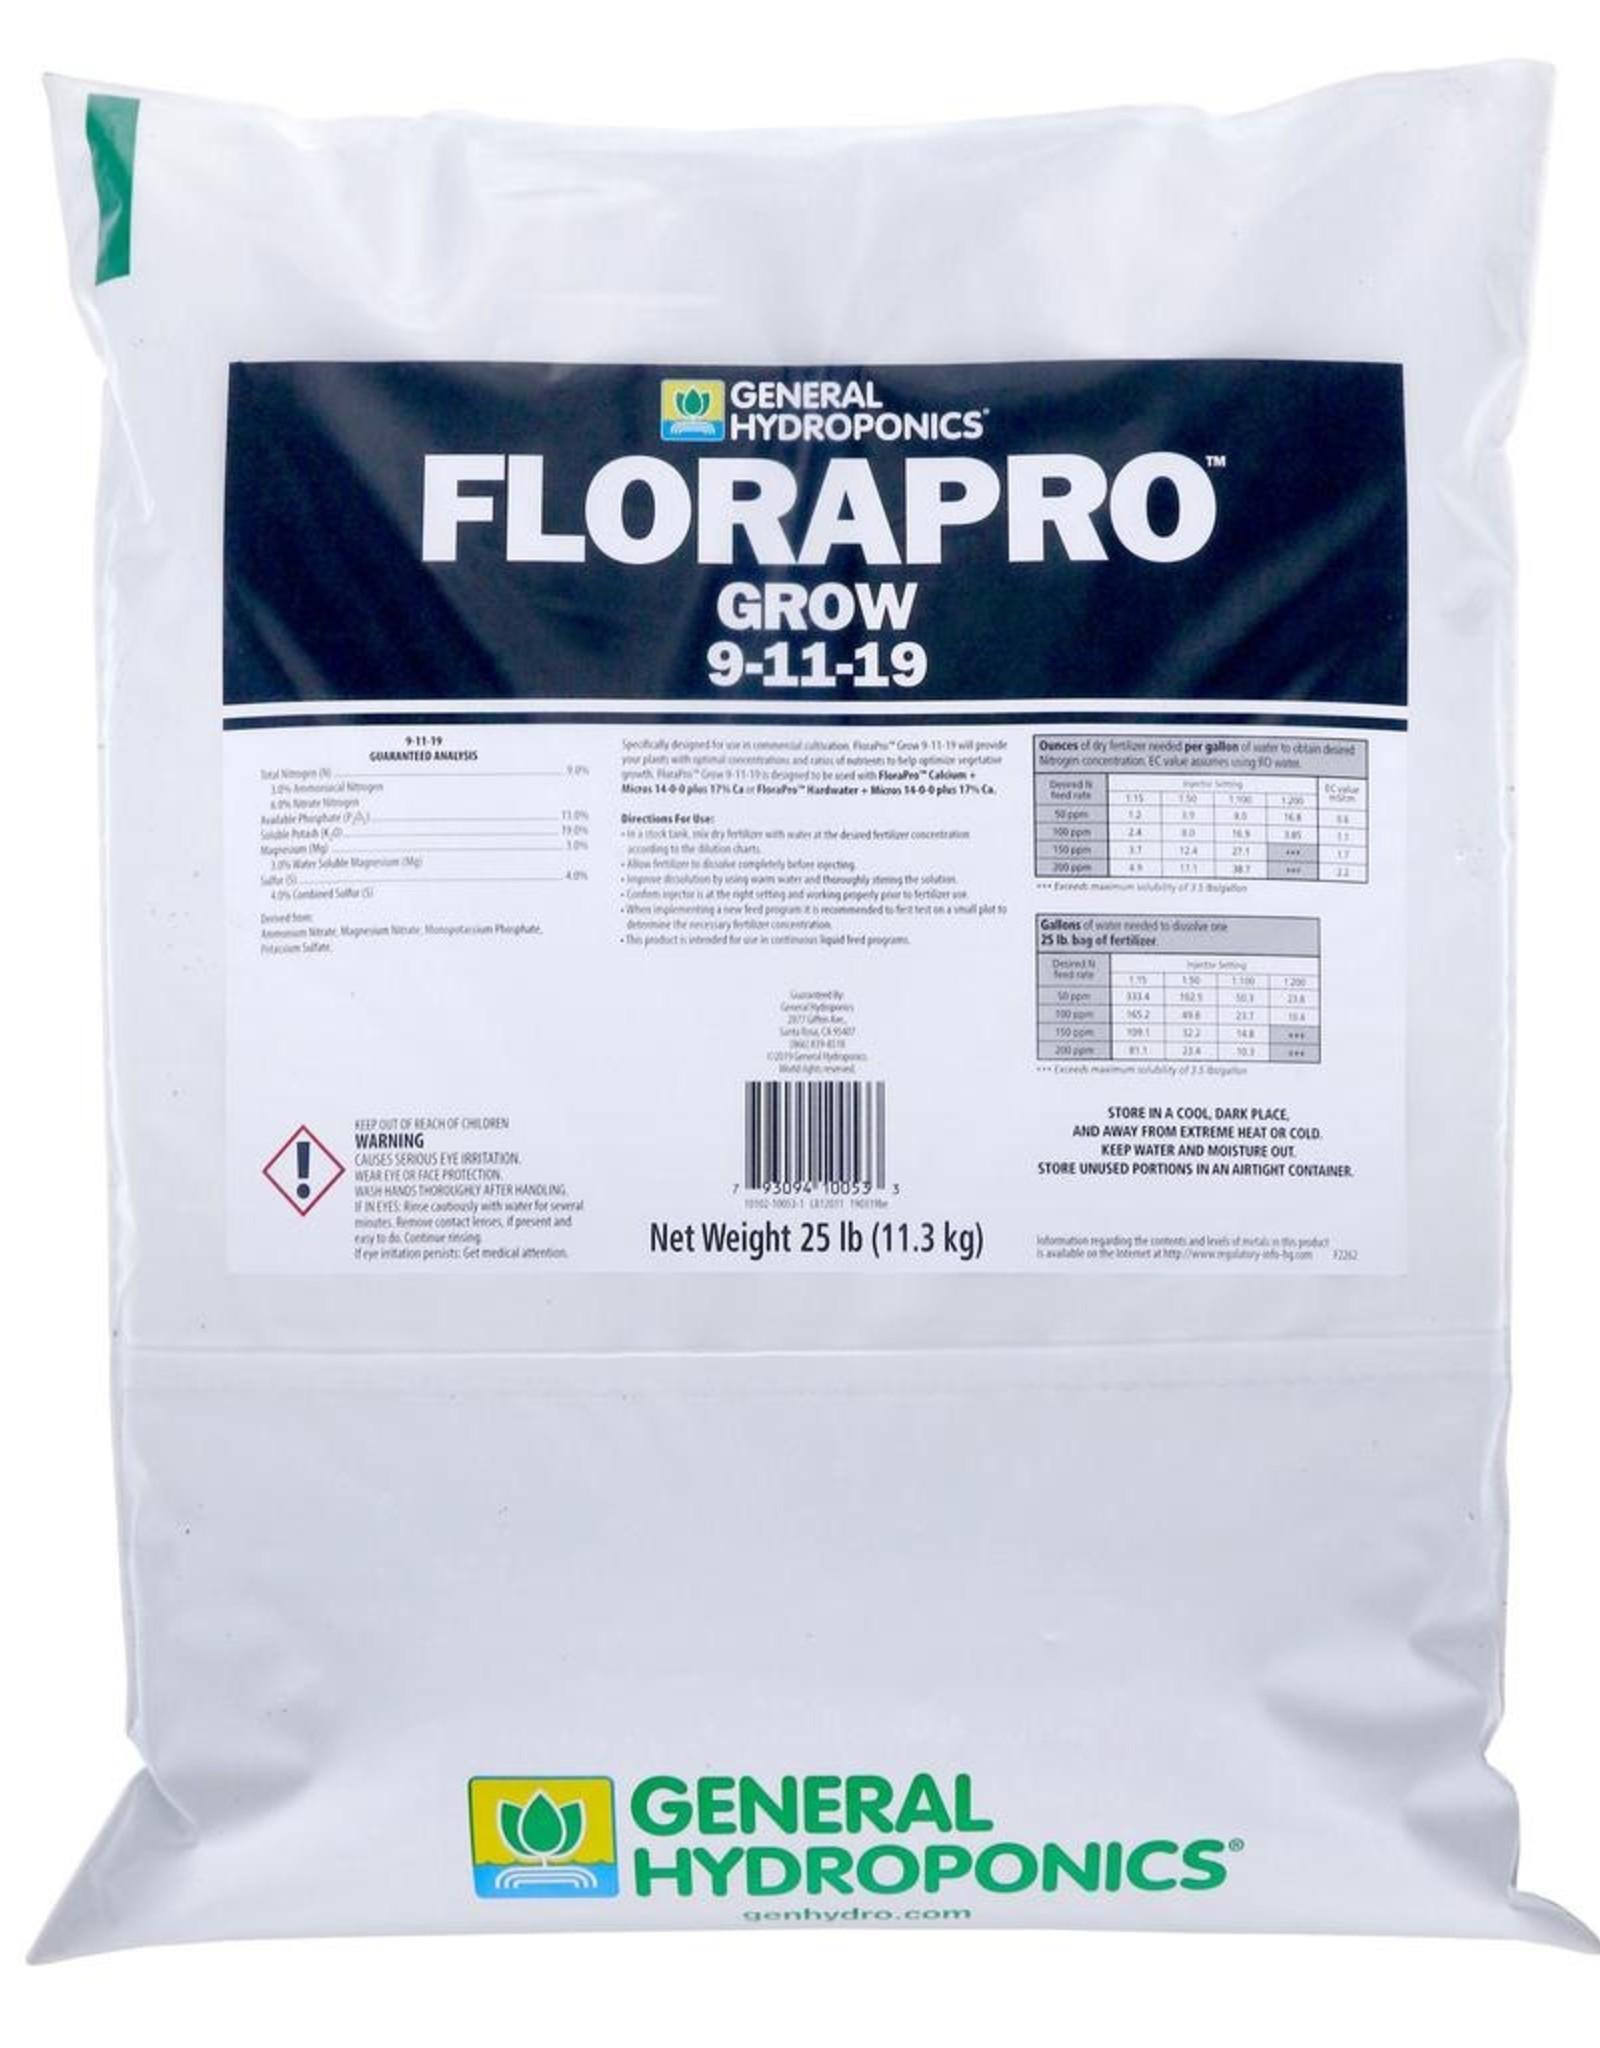 GENERAL HYDROPONICS General Hydroponics FloraPro Grow Soluble 25 lb bag